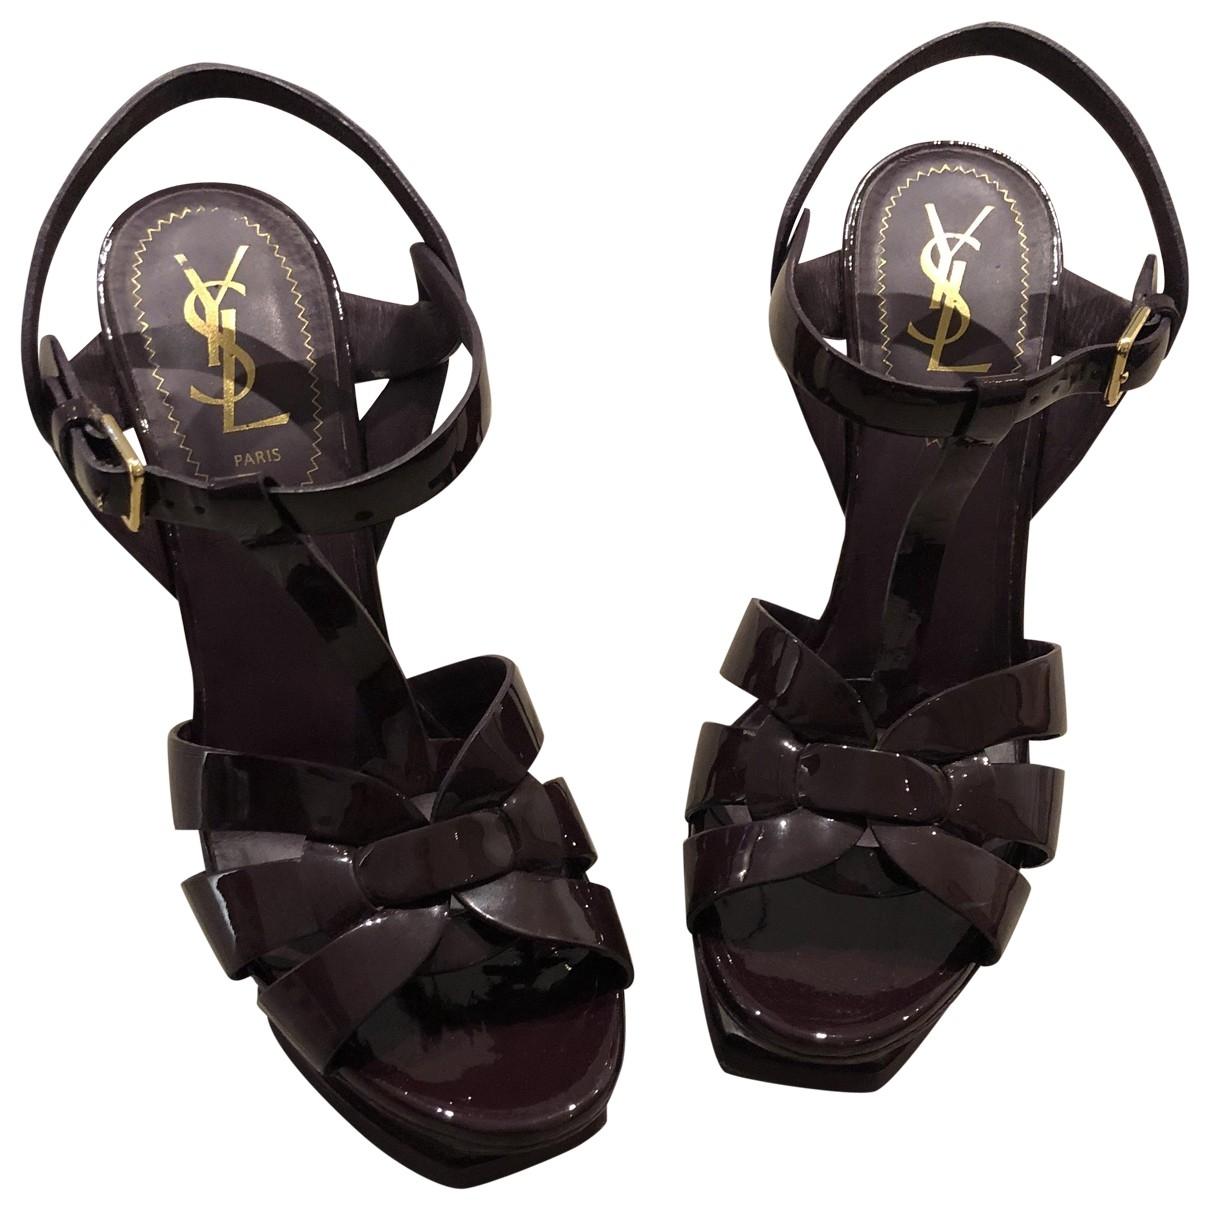 Yves Saint Laurent Tribute Burgundy Patent leather Sandals for Women 37 EU